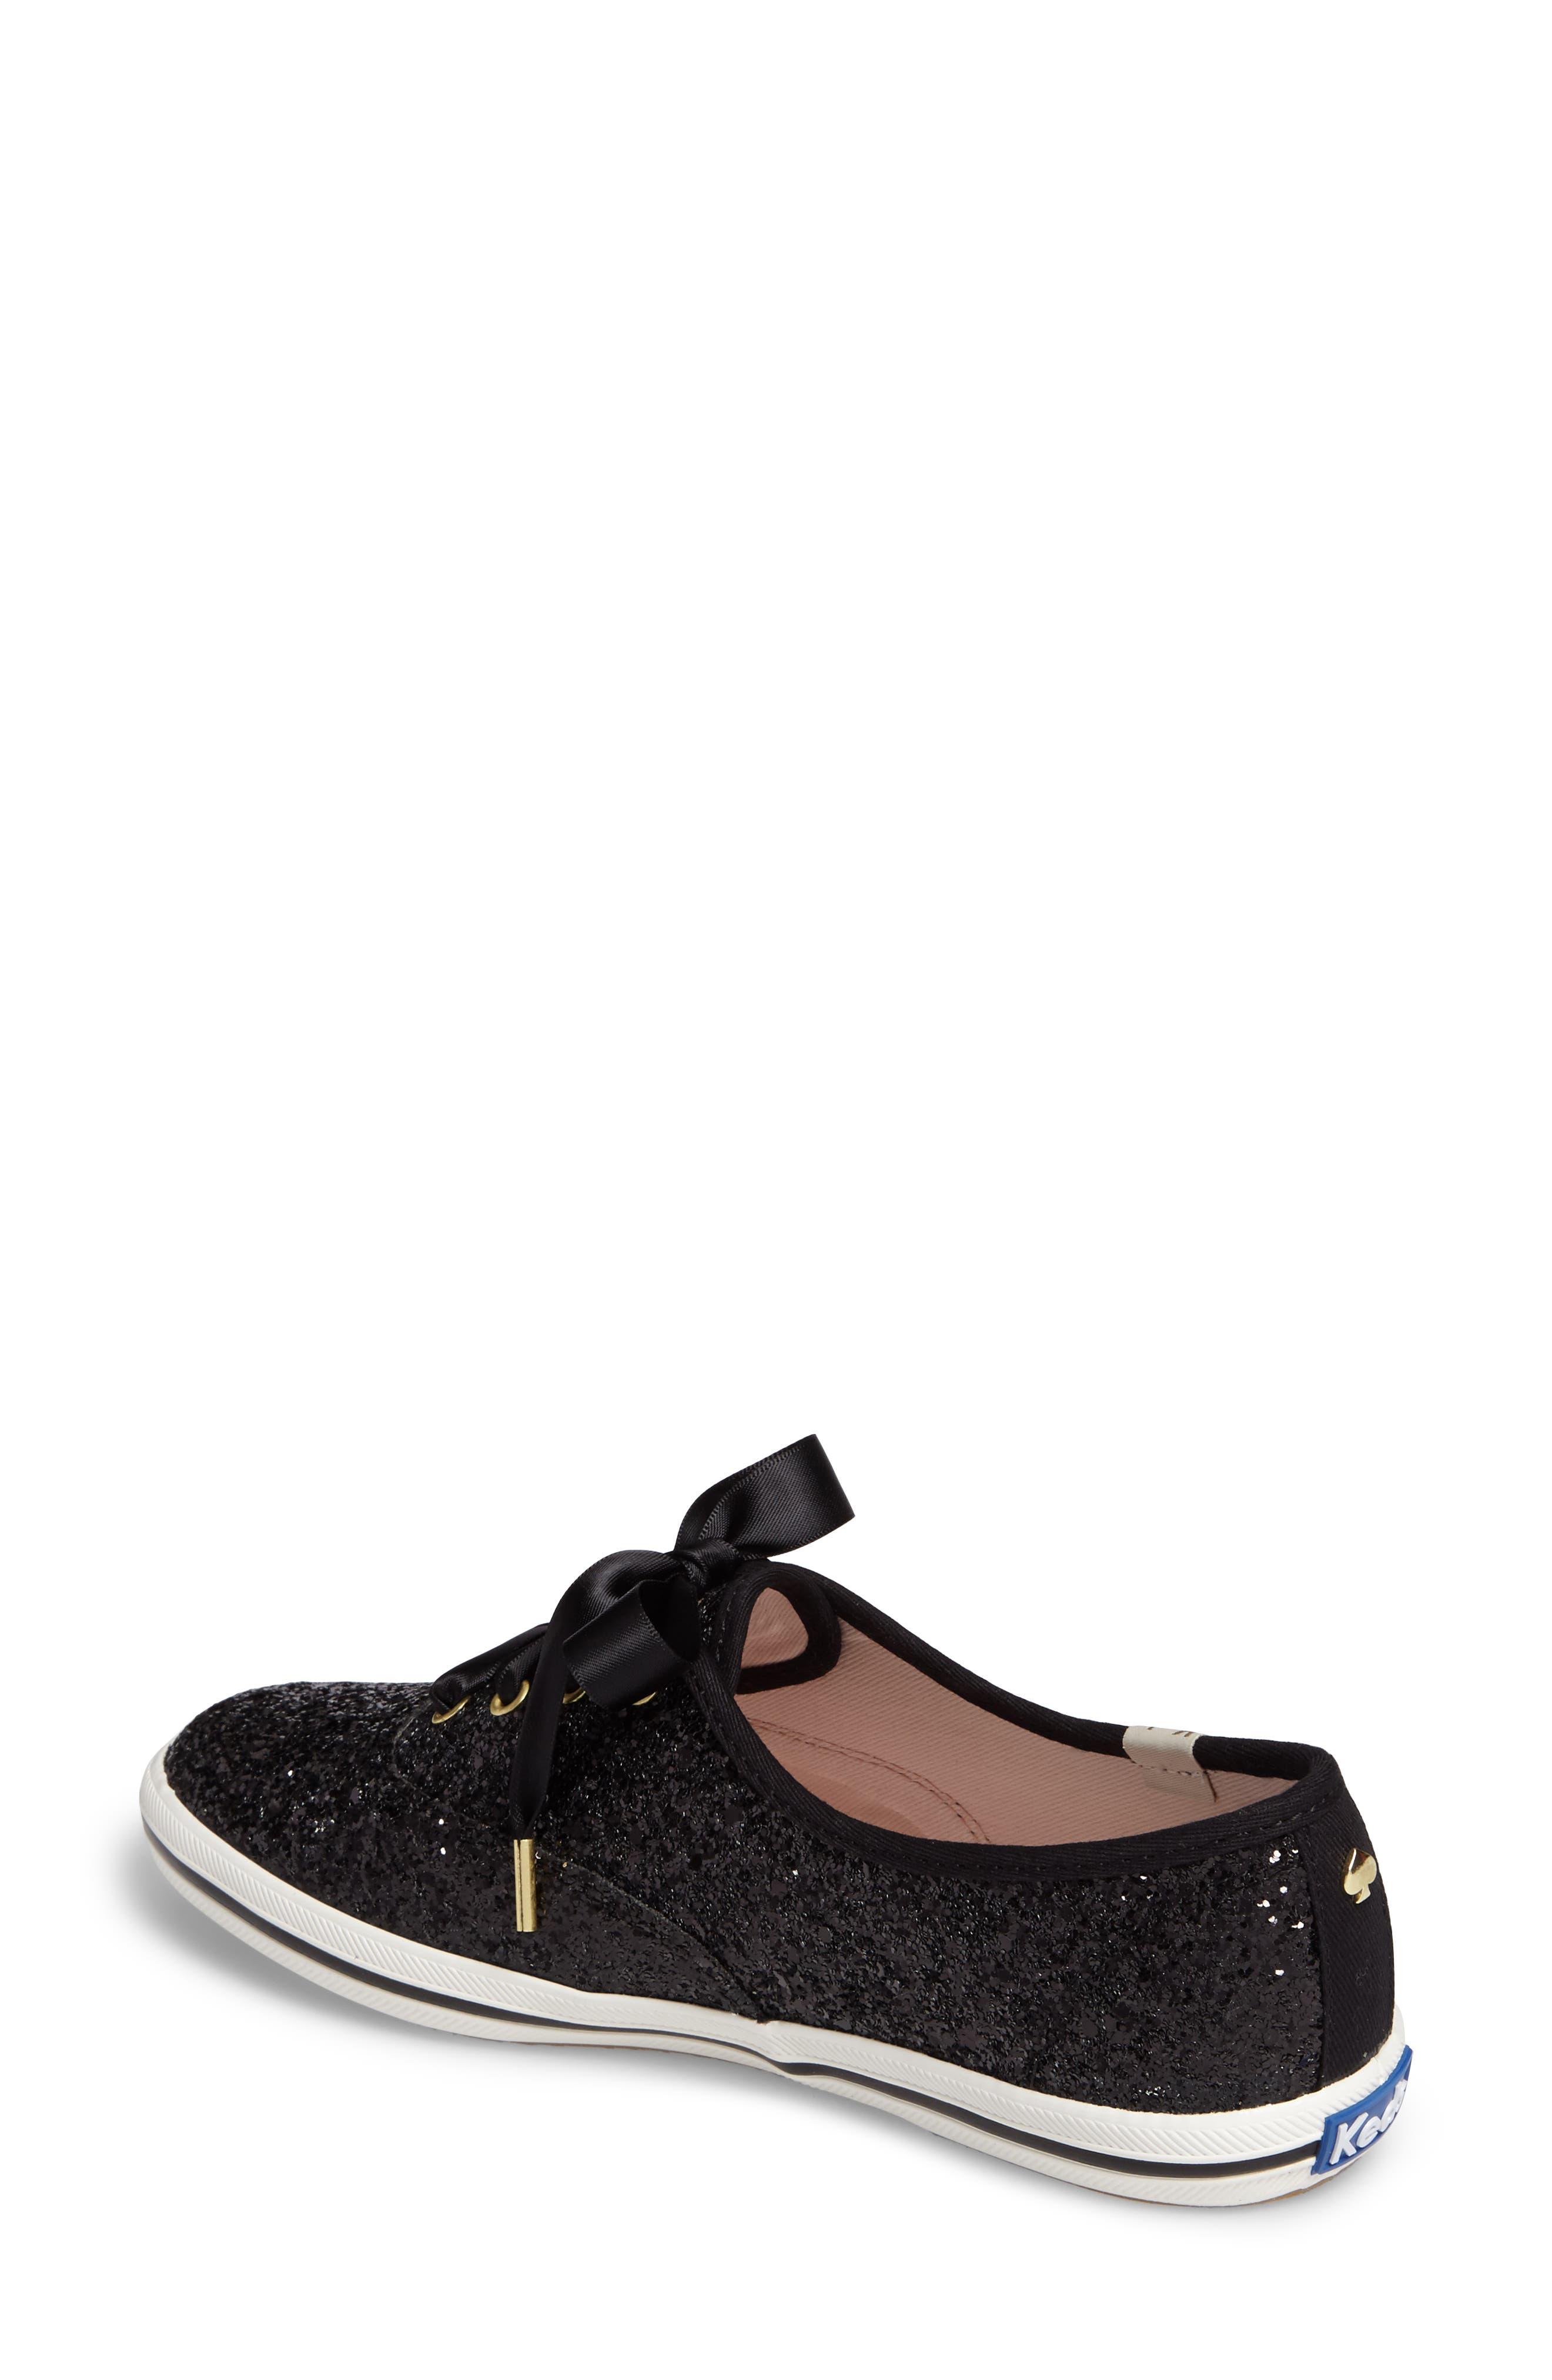 b45bc0e2ae9f glitter shoes